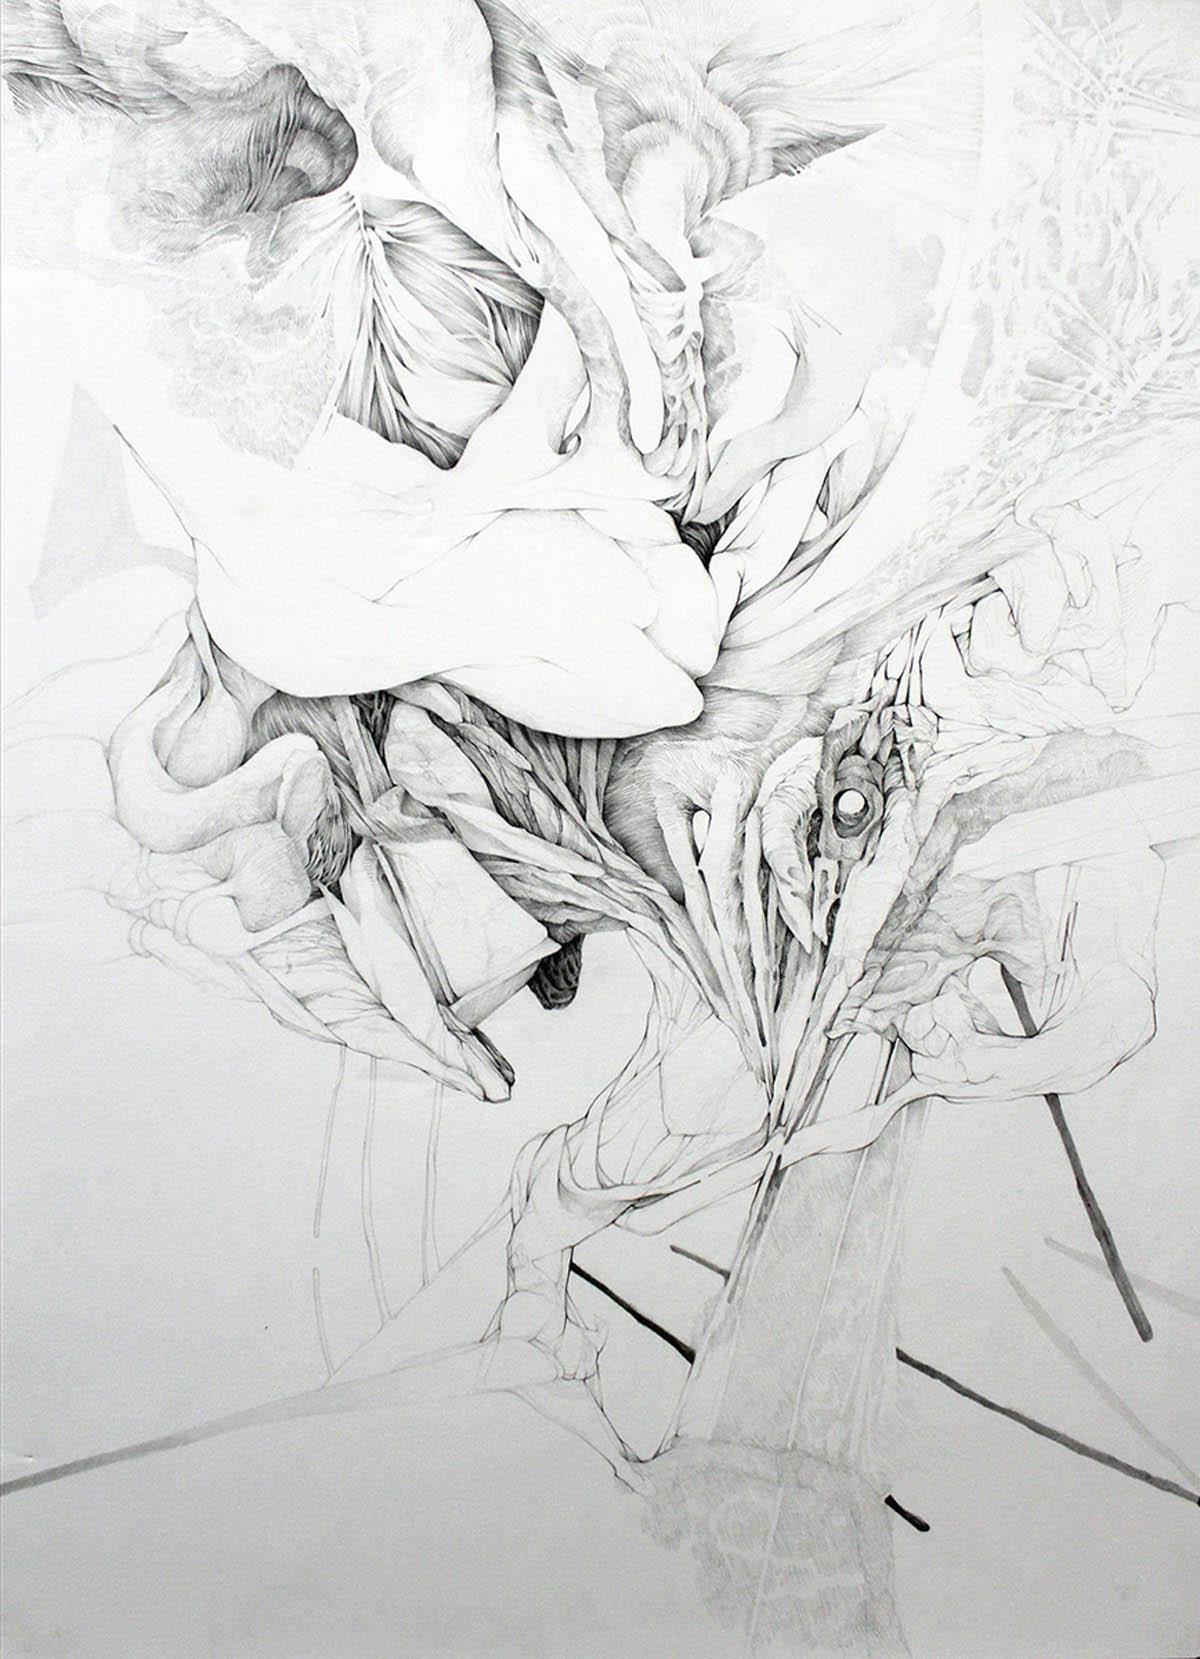 Anna Kenar Zgubna Postać III graphite on paper 22 x 30 inches AKE 003G.jpg